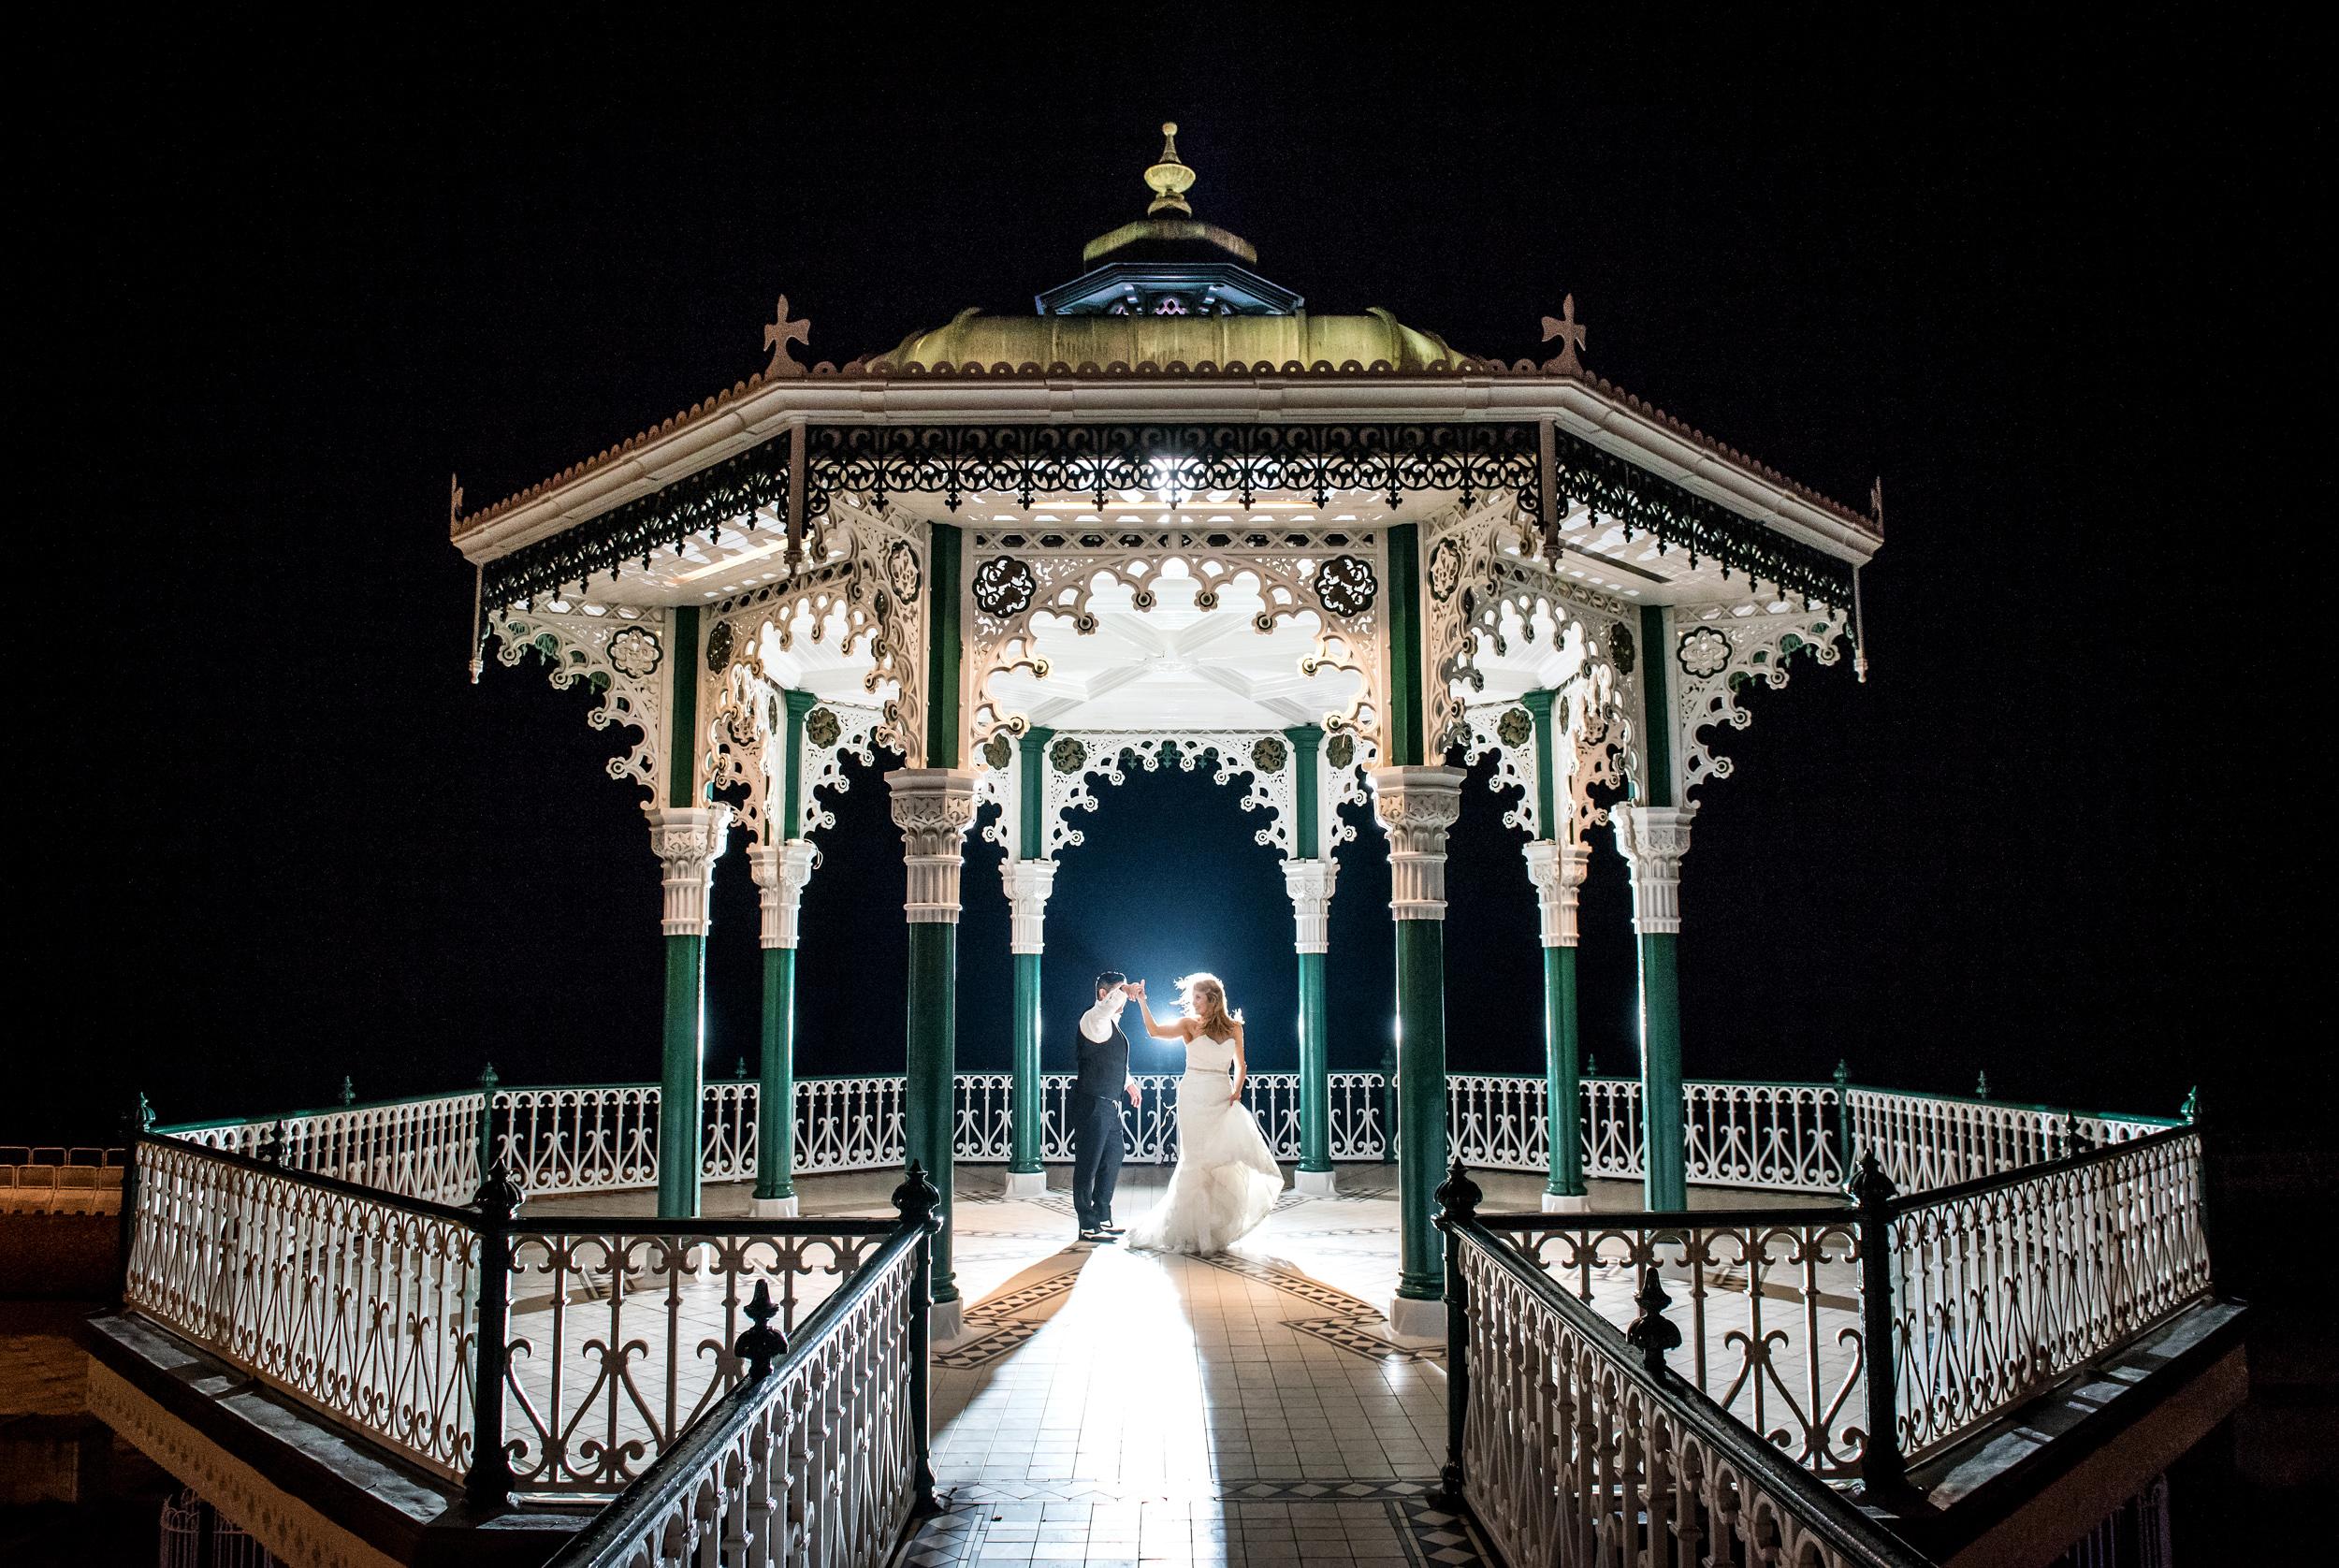 David Scholes Lancashire wedding photography 2016-106.jpg